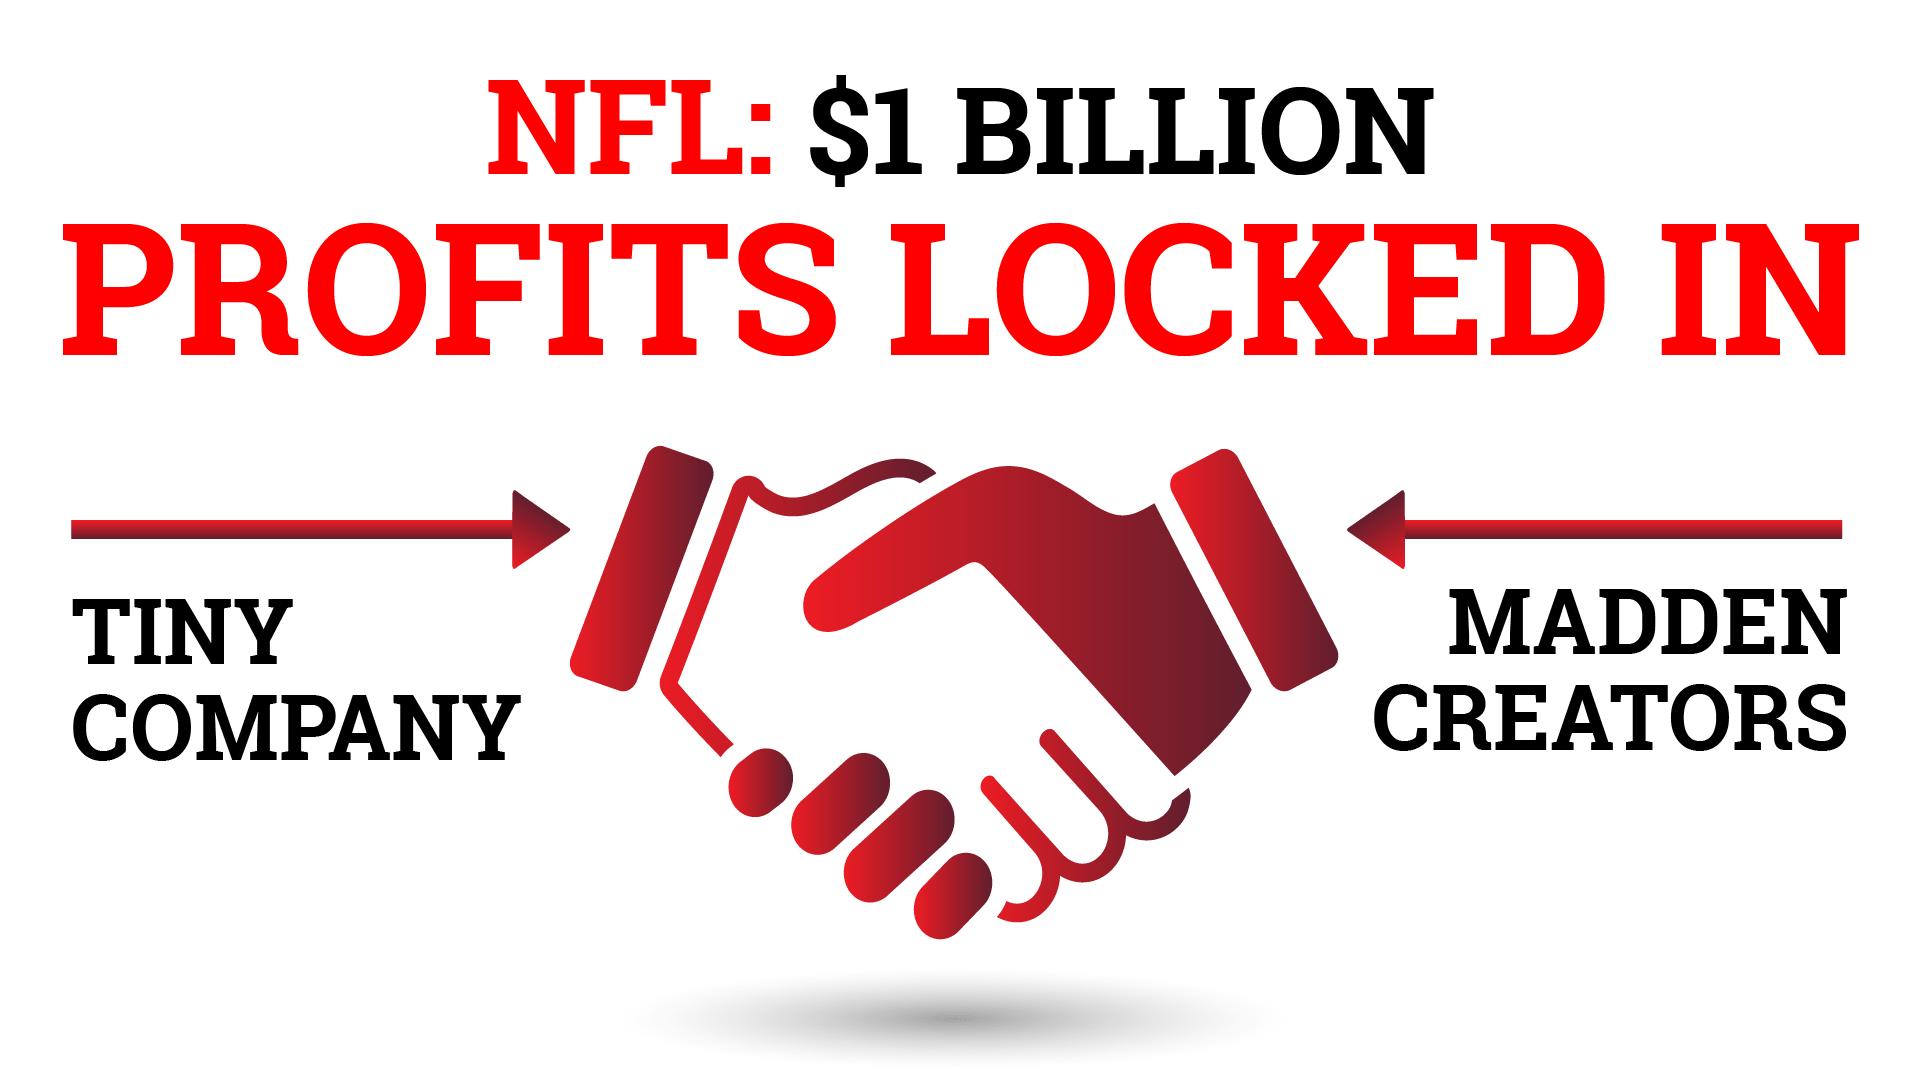 NFL: $1 Billion. Profits Locked In